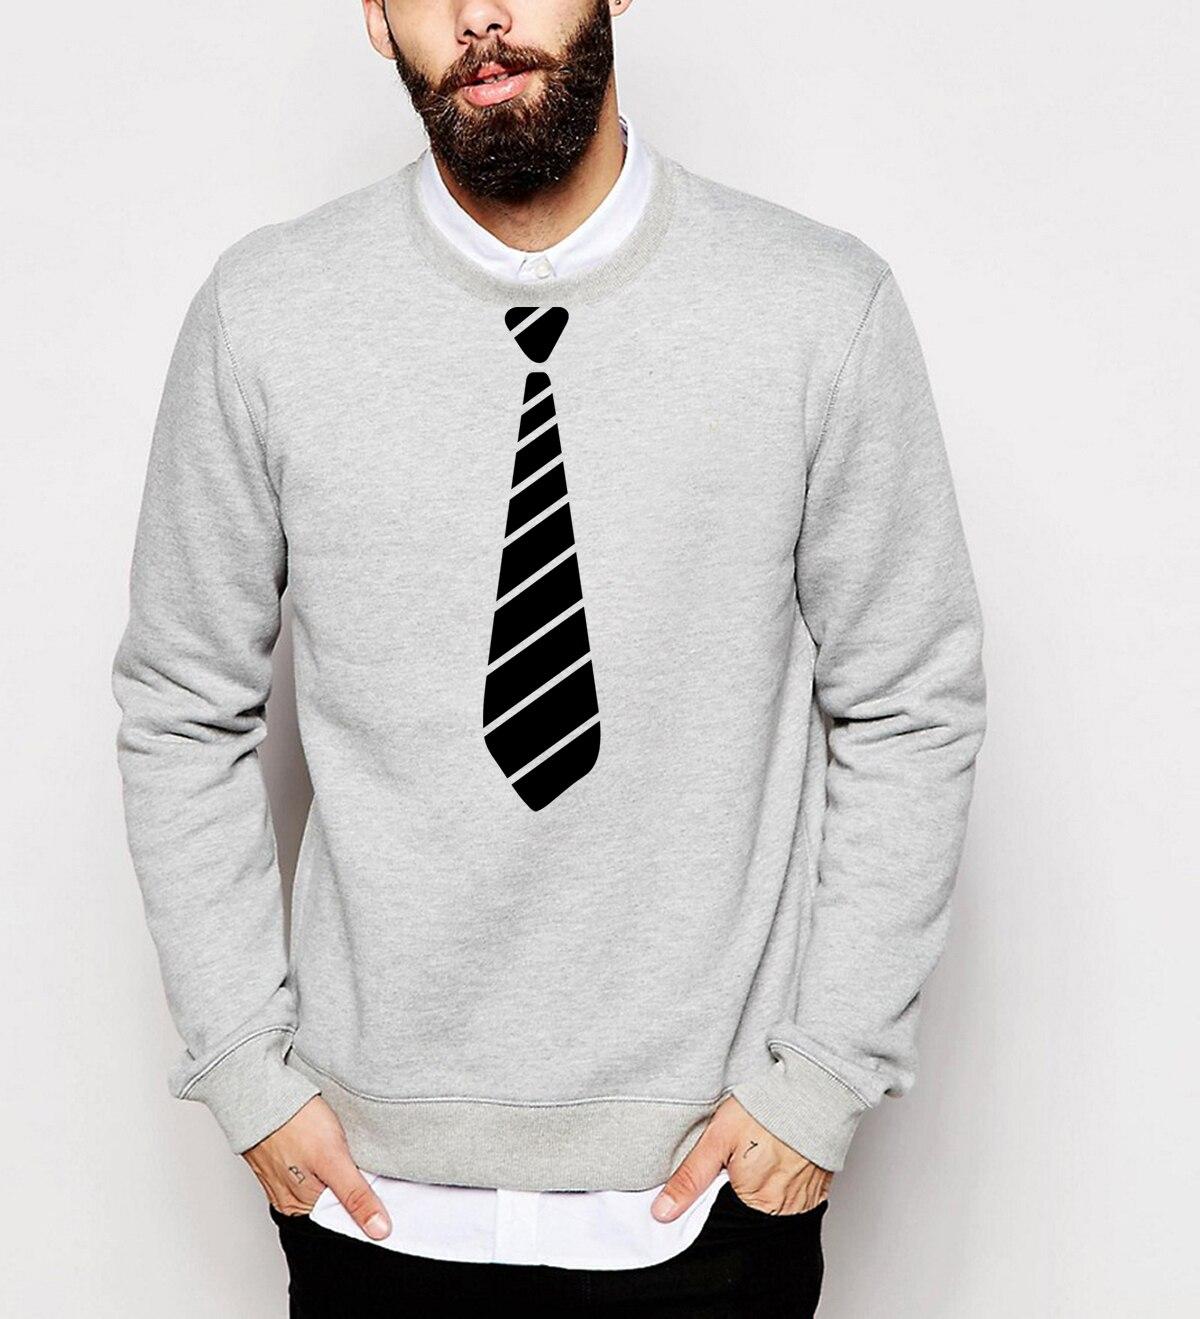 Funny 2019 autumn clothing fashion hip-hop fleece hoodies mma design men harajuku sweatshirts streetwear top fitness tracksuits